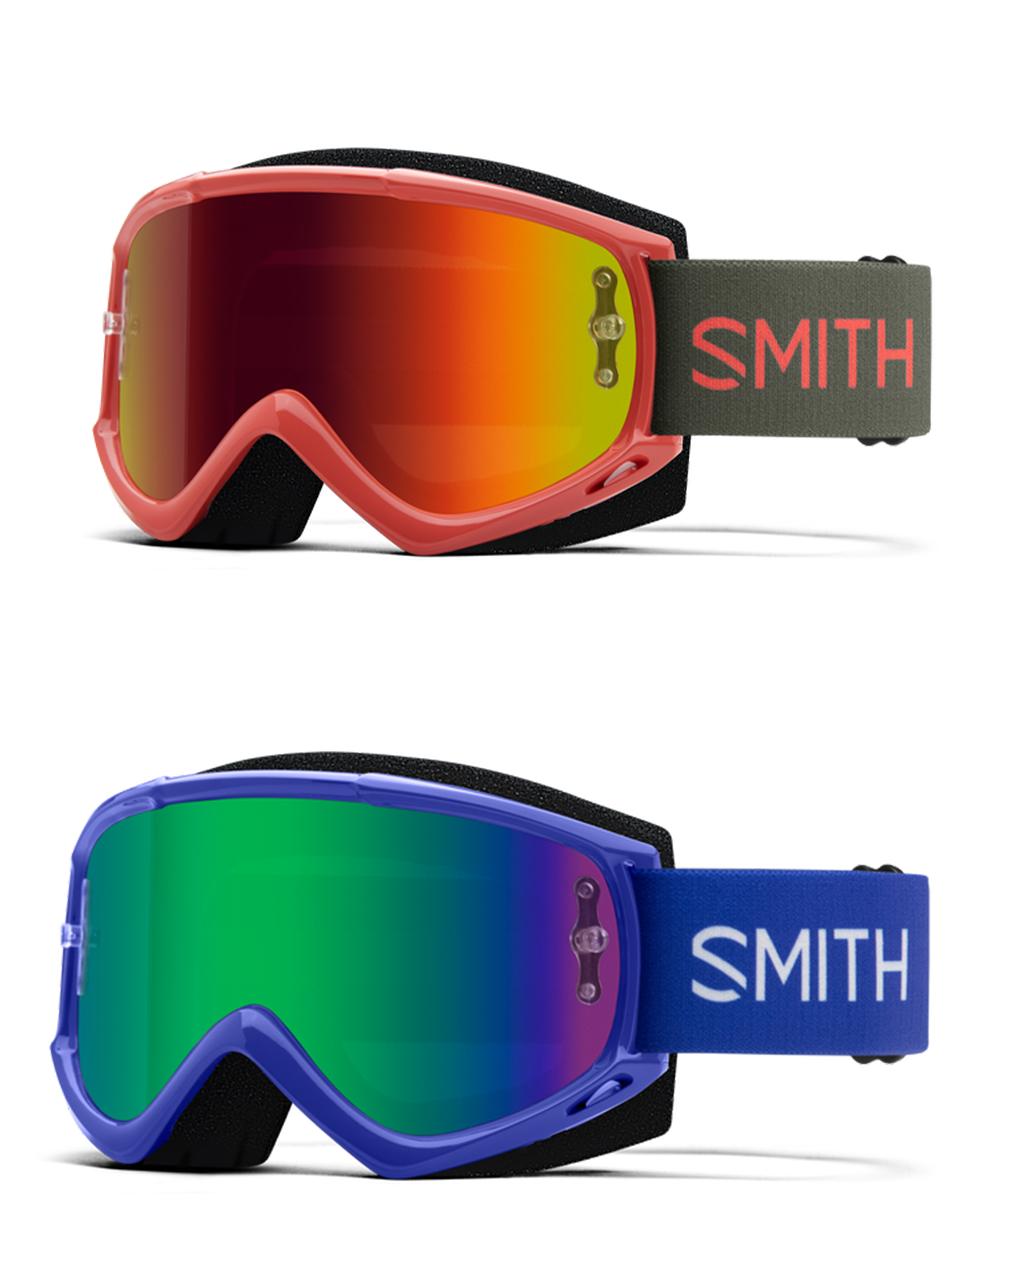 SMITHOPTICS Smith Fuel V1 Goggles